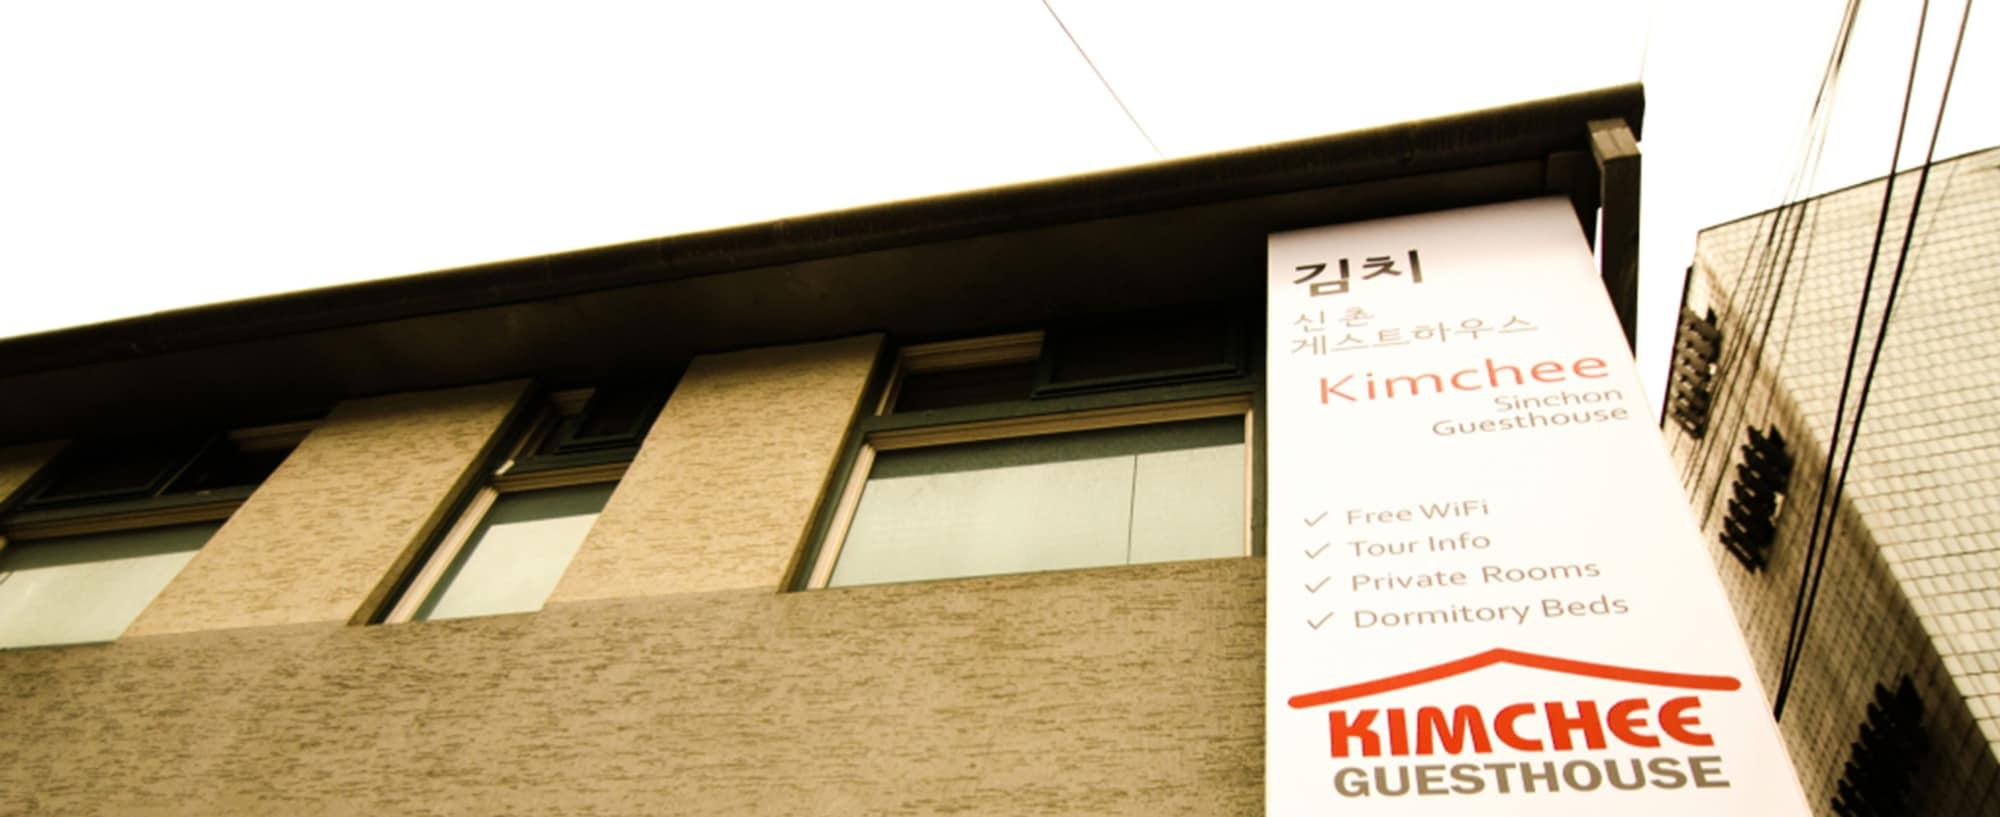 Kimchee Sinchon Guesthouse - Hostel, Seodaemun